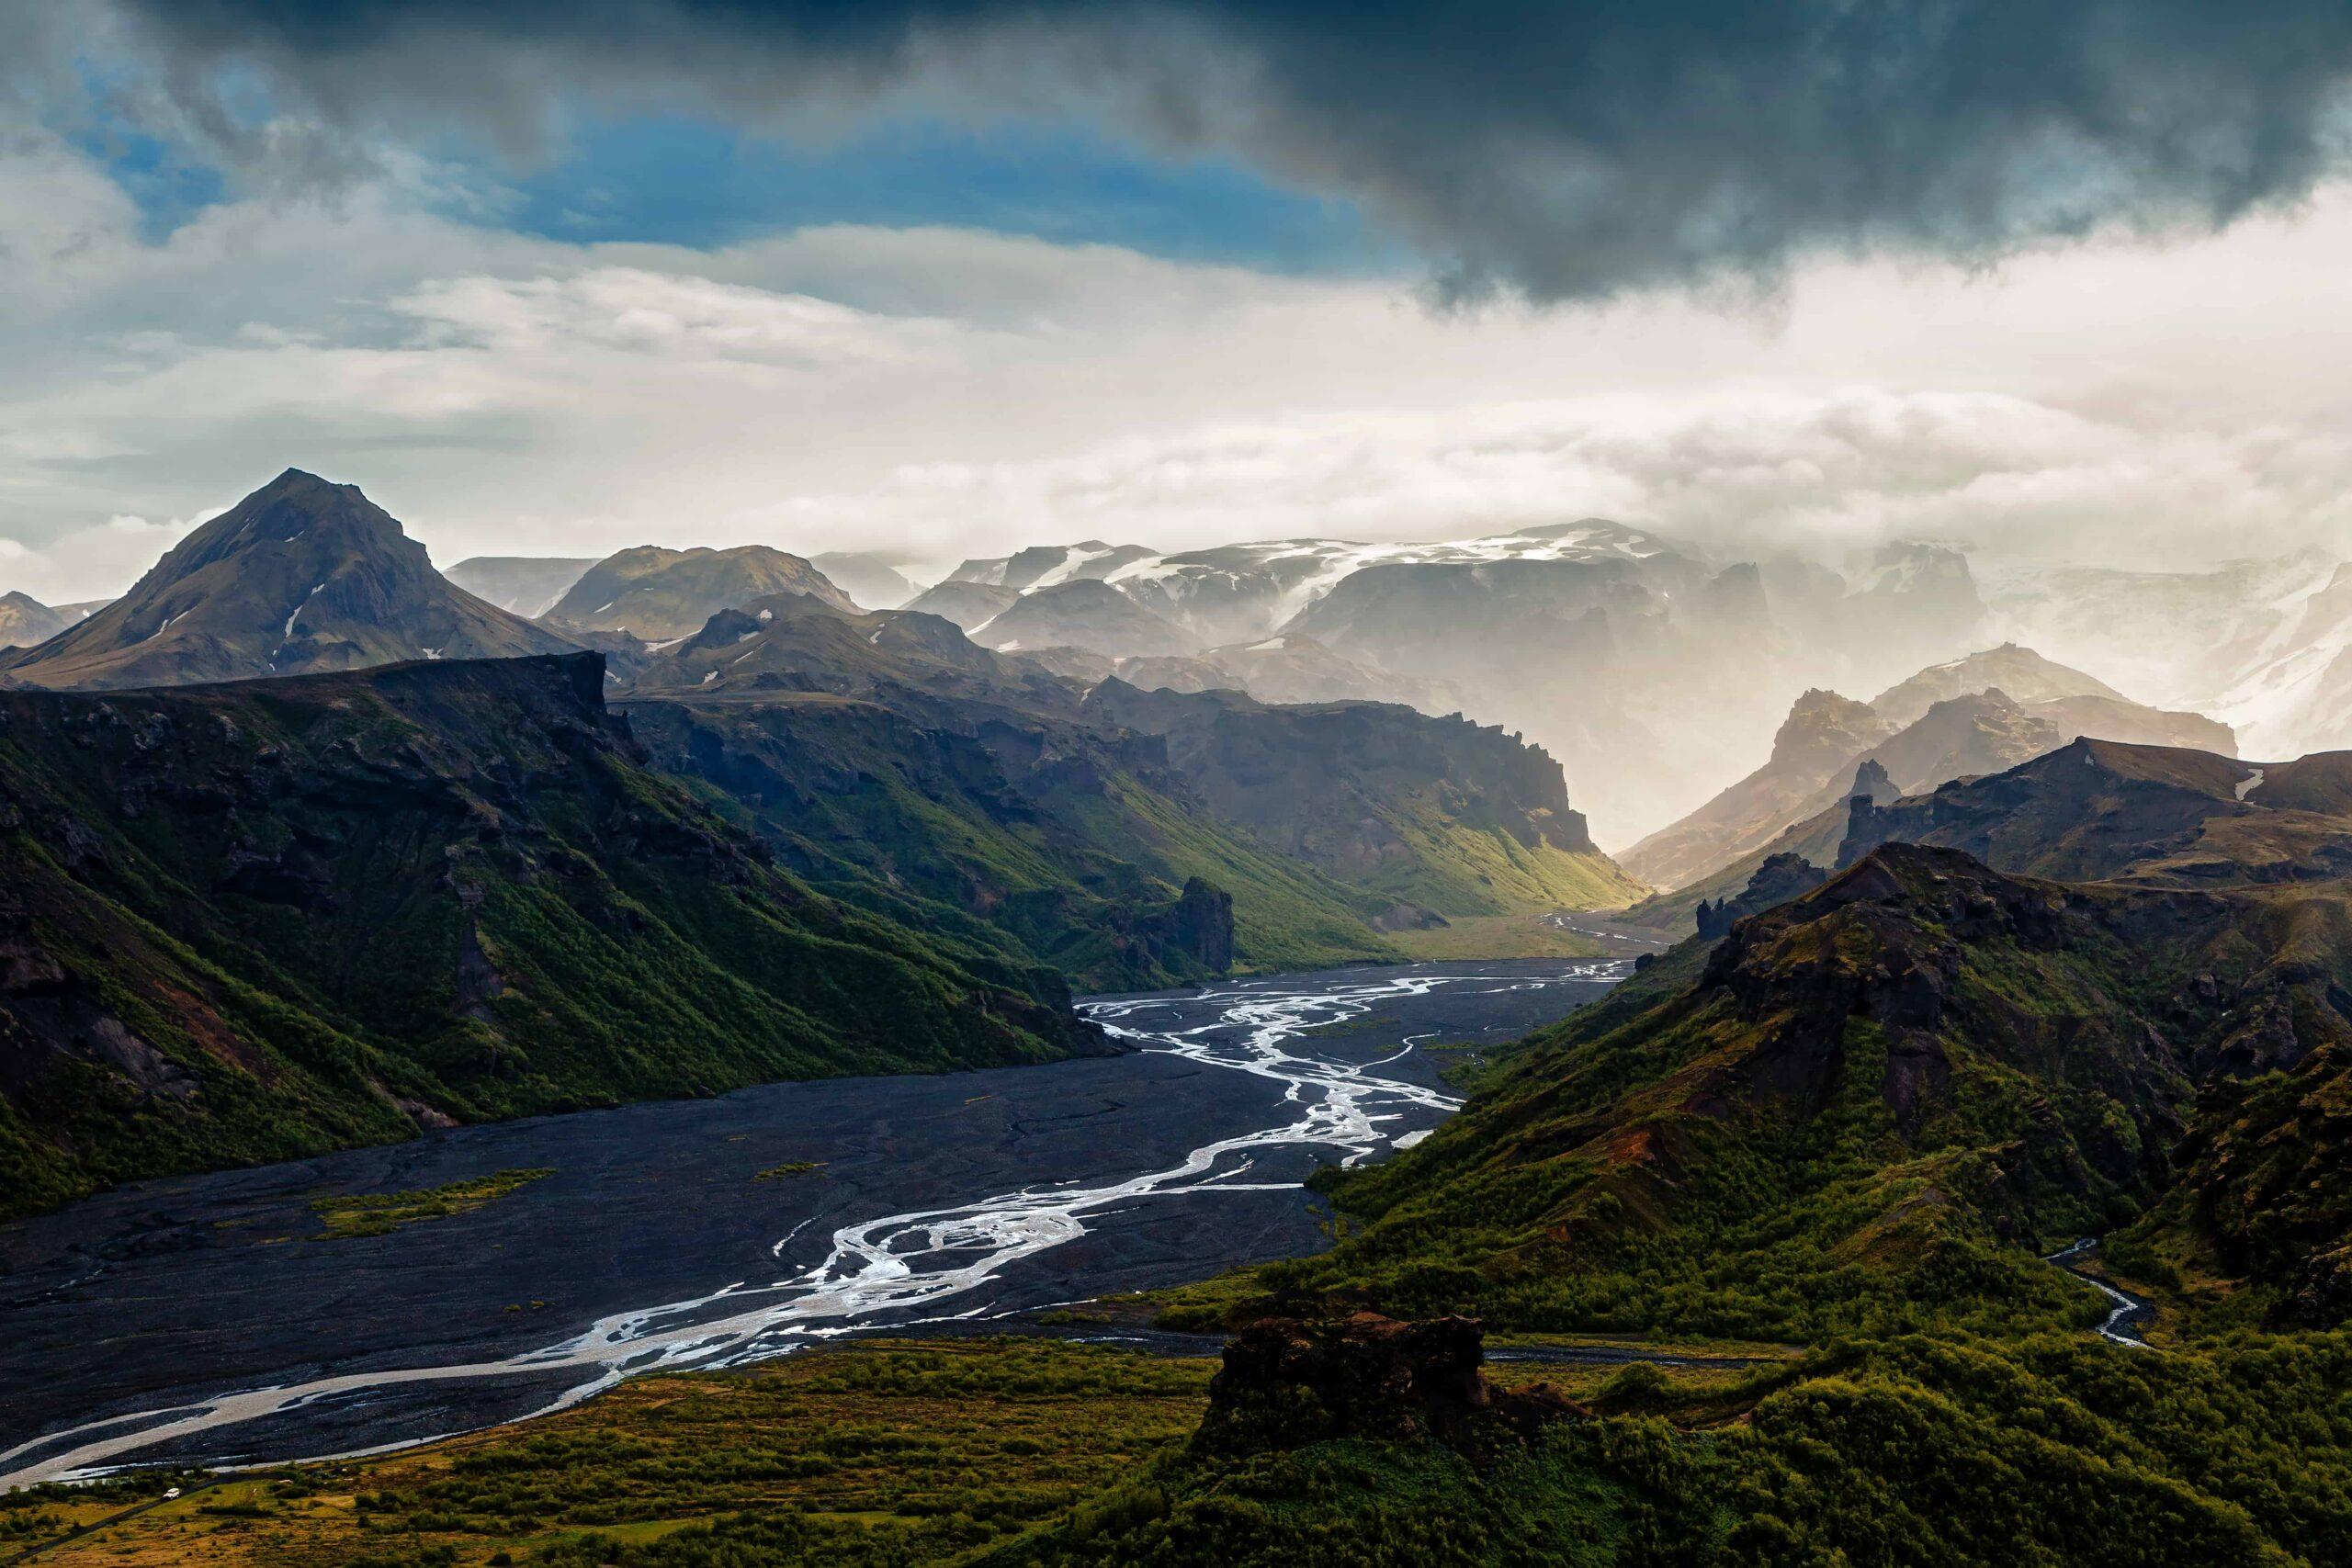 Þorsmork and Eyjafjalljokull volcano